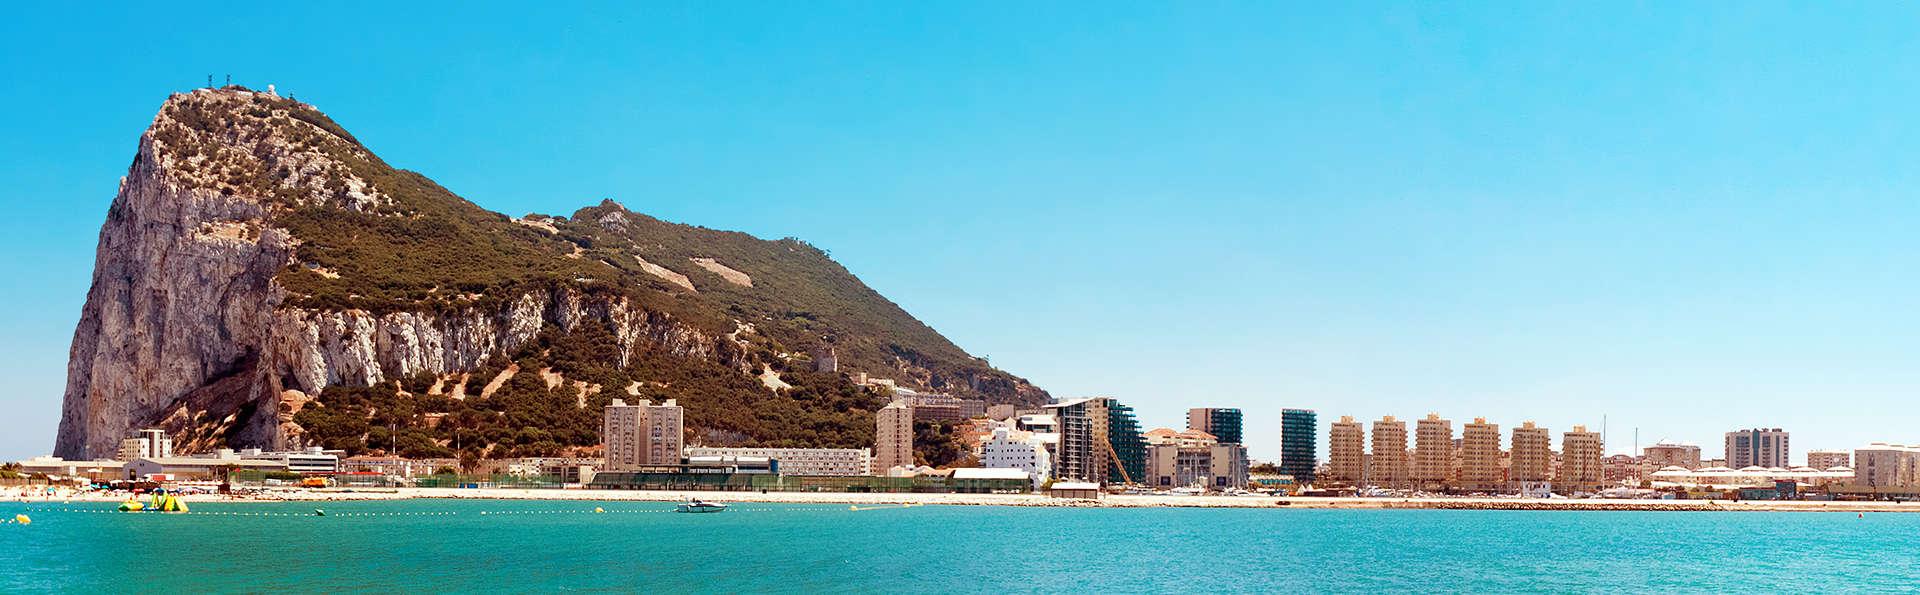 Escapada a dos pasos de Gibraltar con vistas a la Bahía